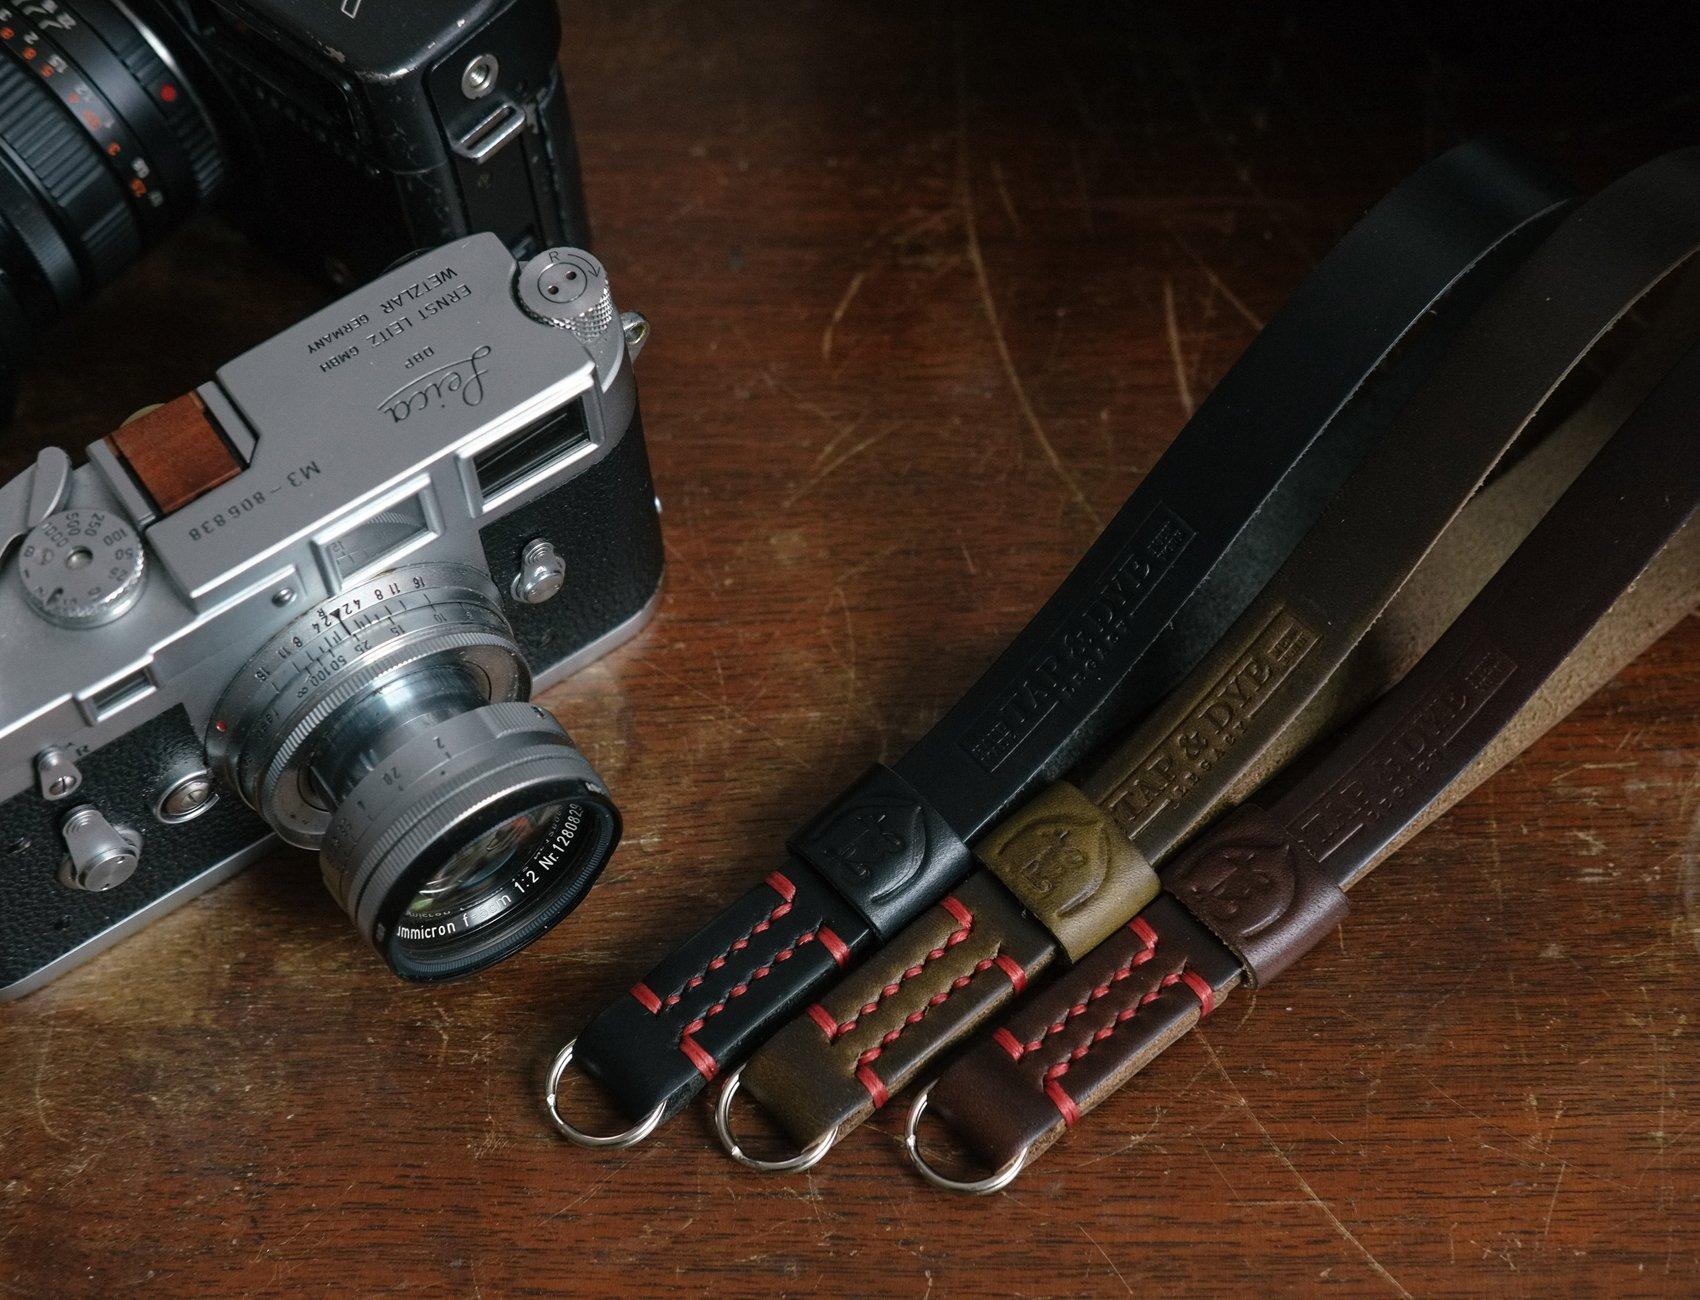 wrist strap for camera 4 image